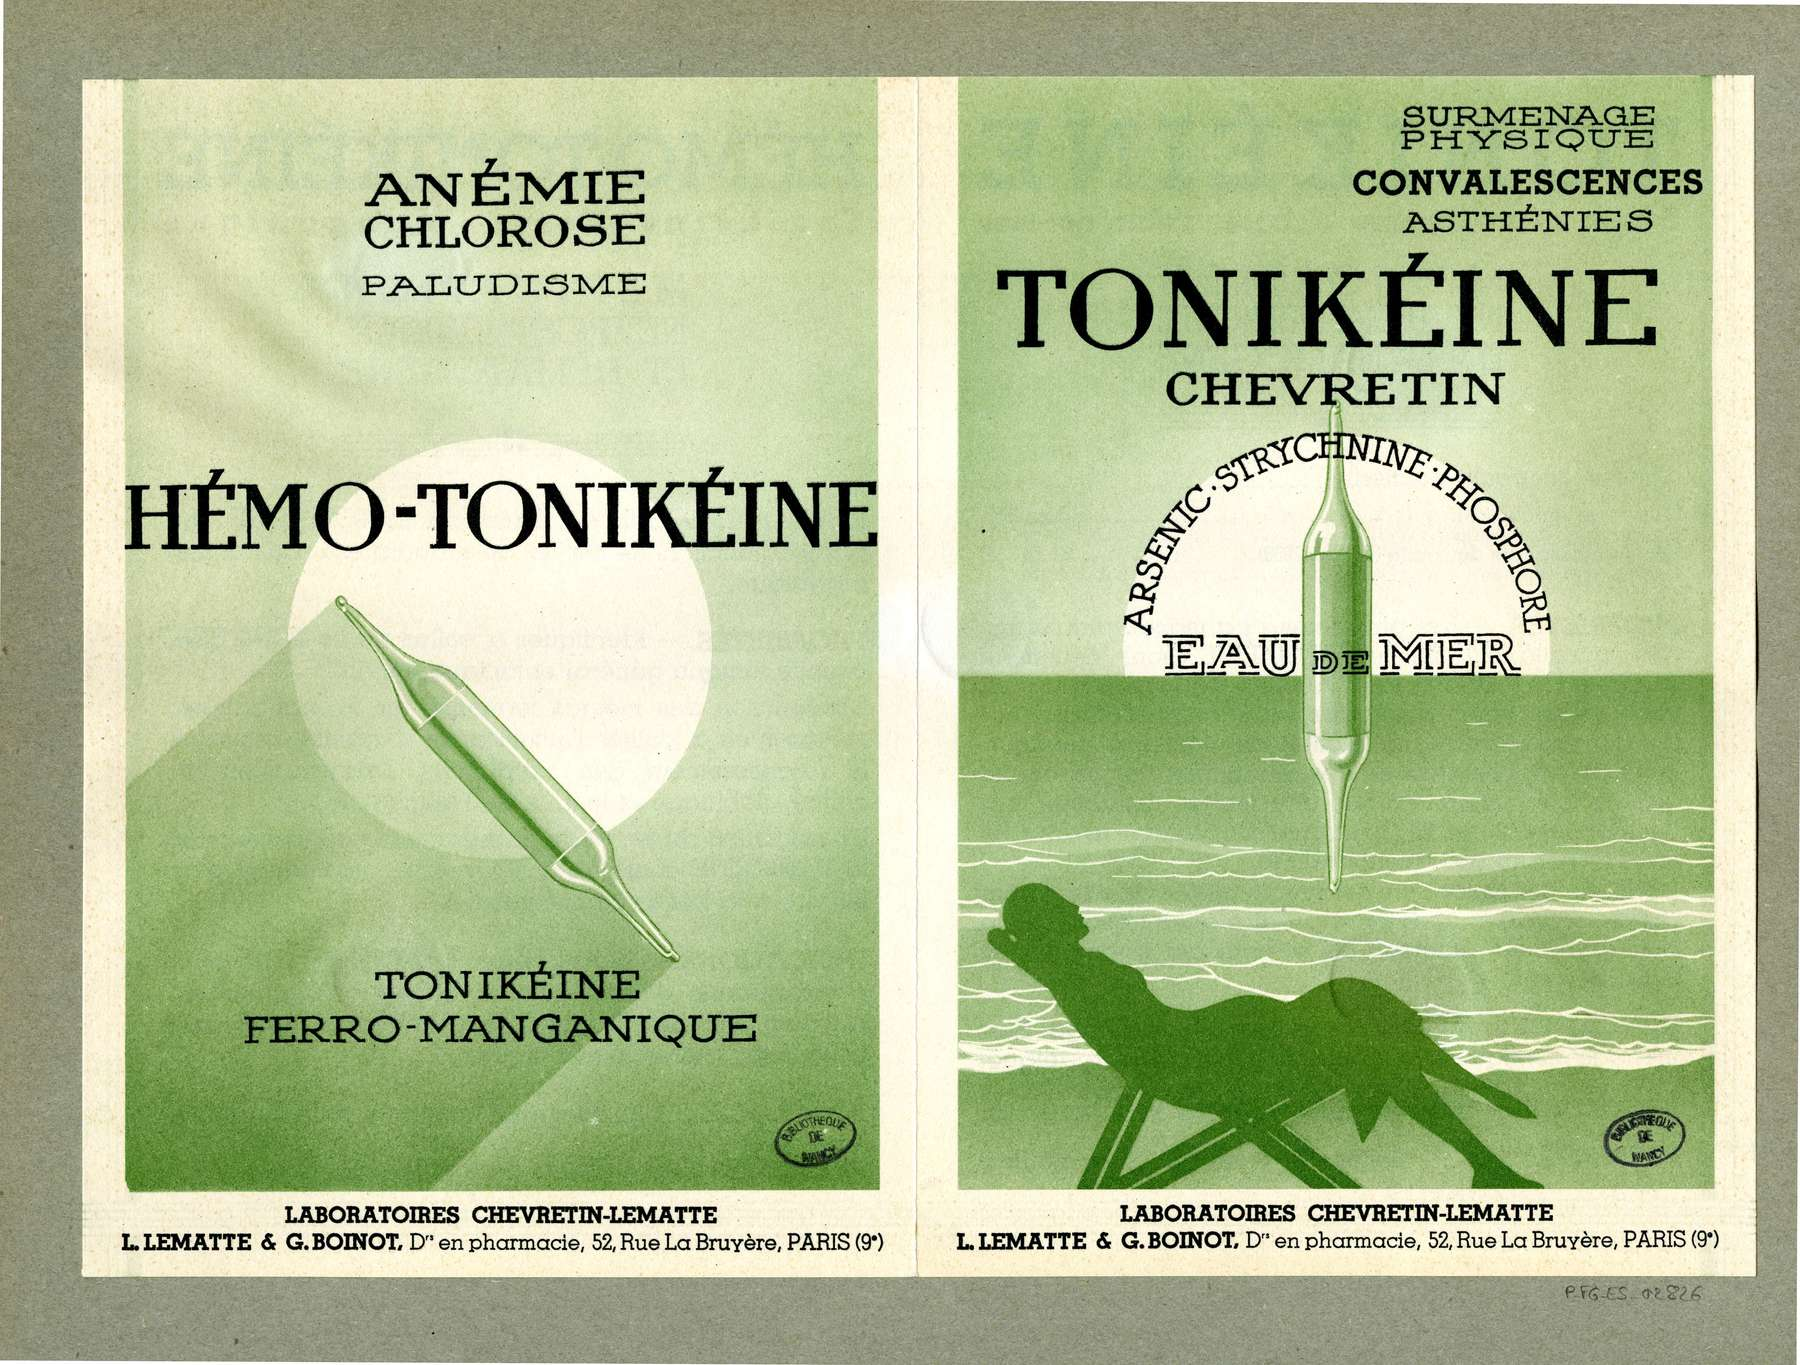 Contenu du Tonikéine